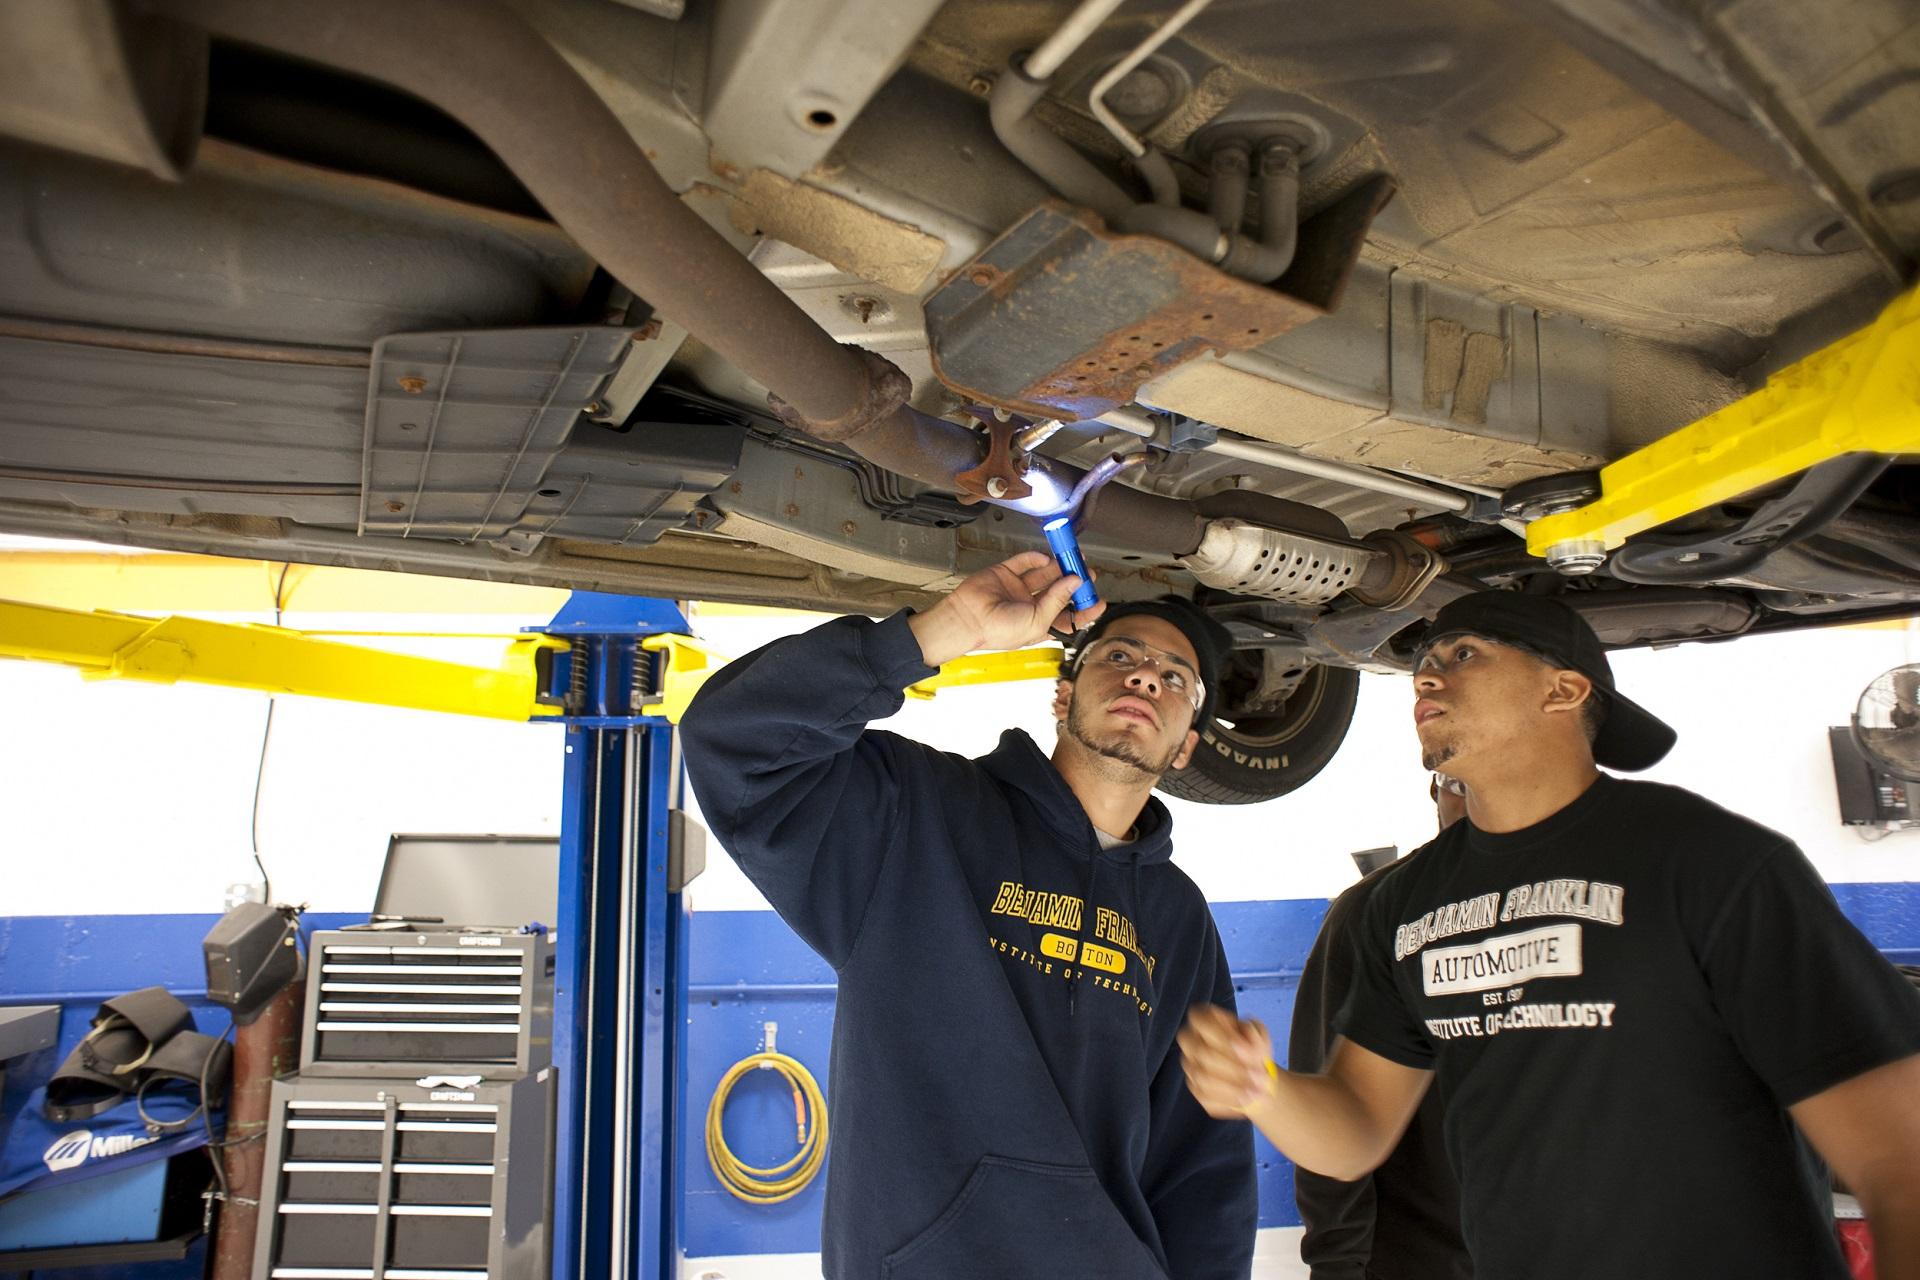 Automotive Technology Degrees - A Wide Open Field